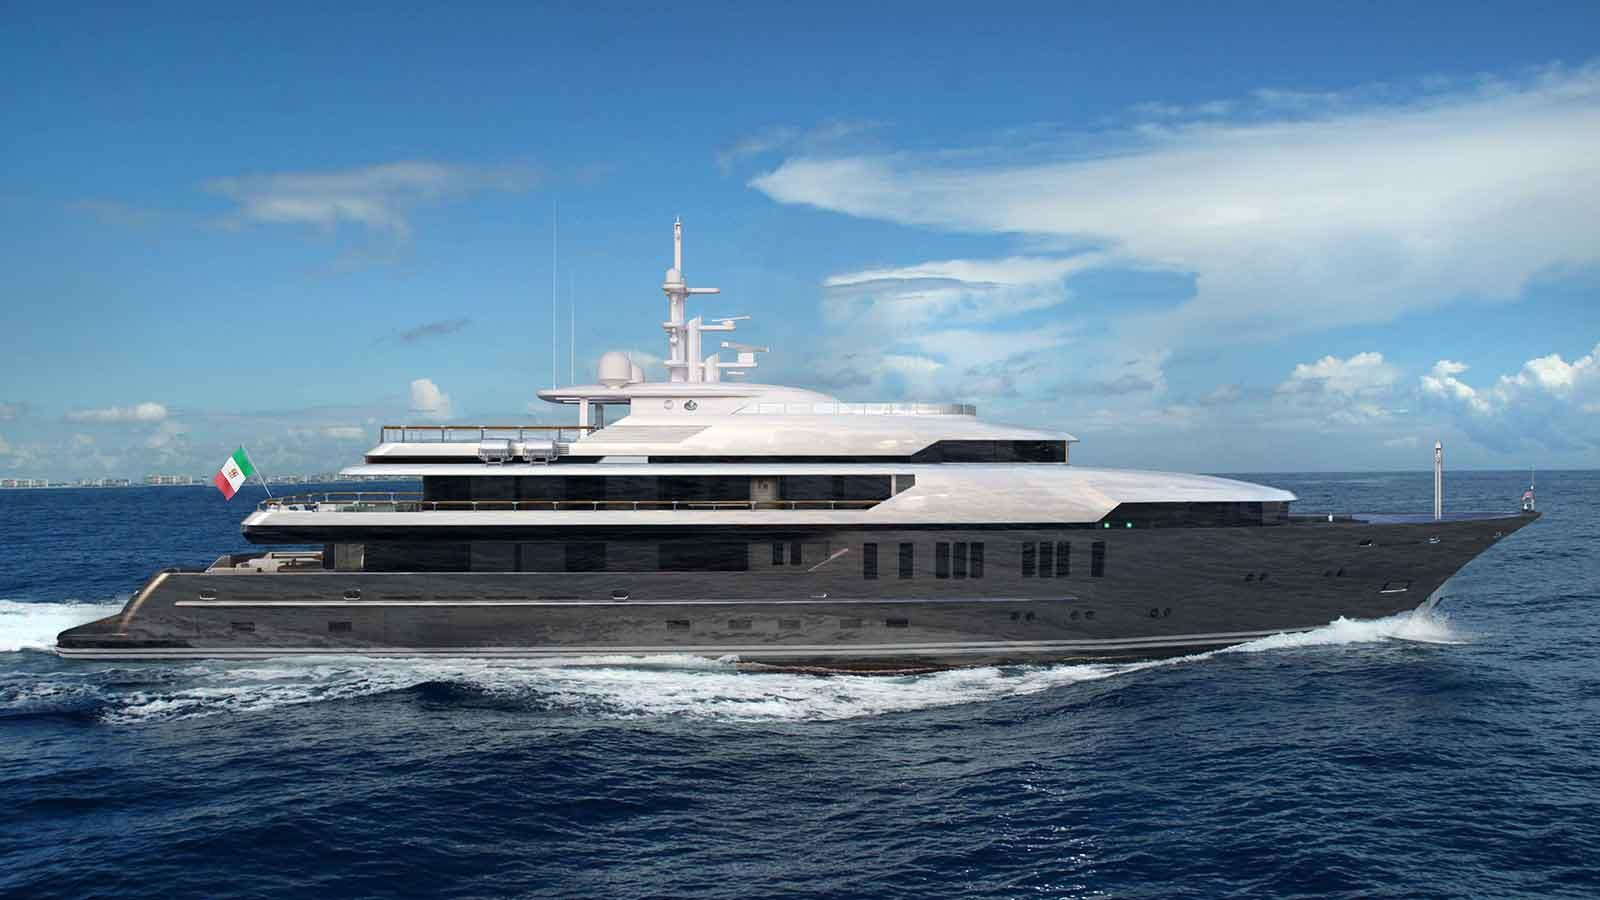 vsy-hull-003-motor-yacht-viareggio-superyachts-2018-64m-profile